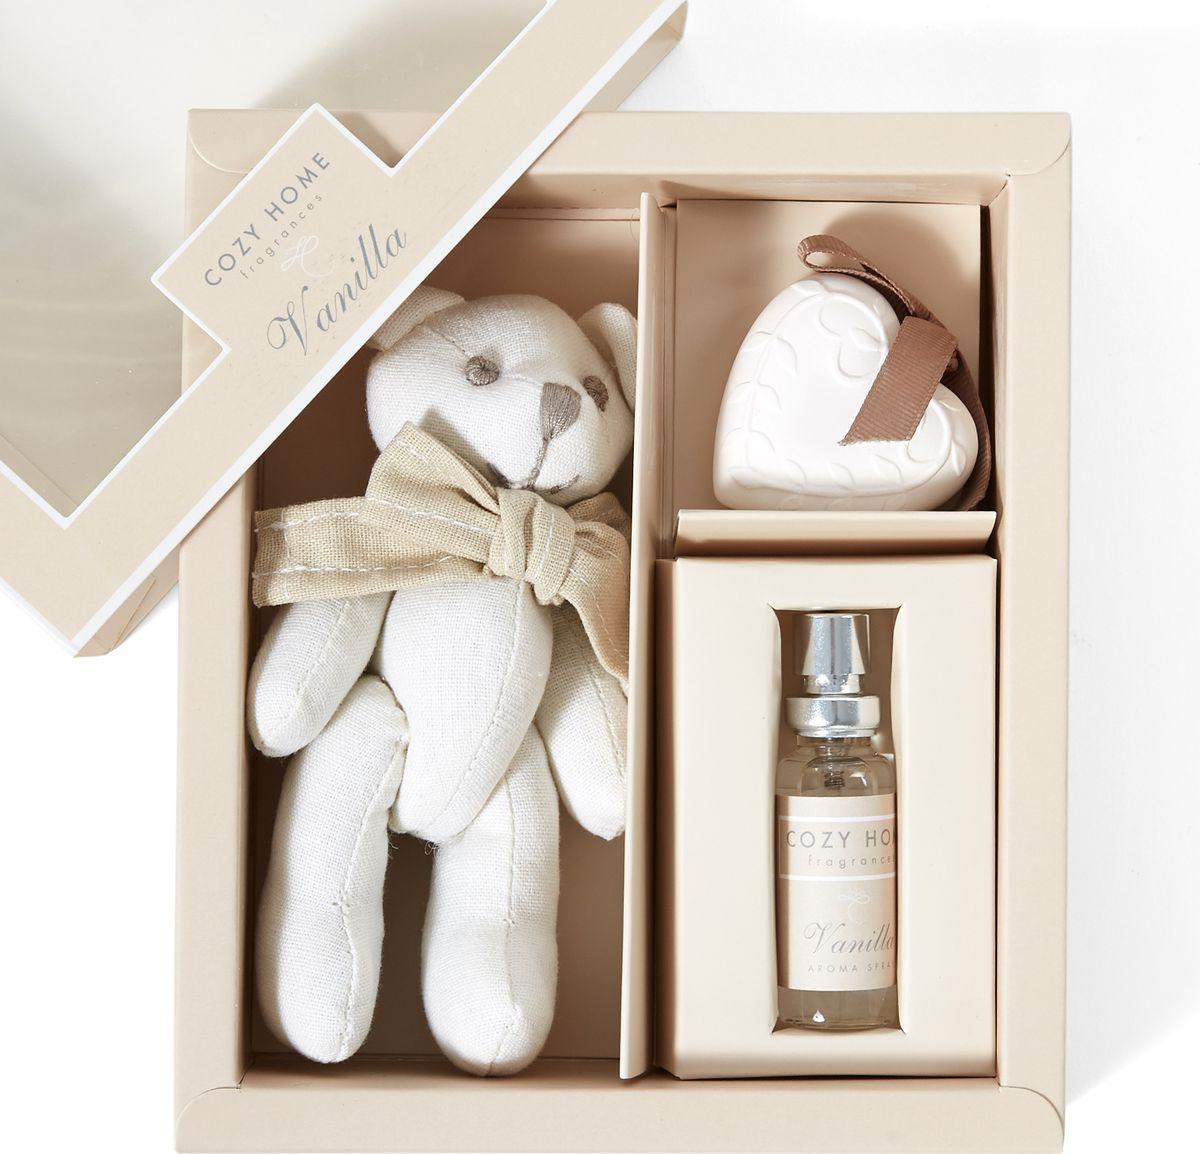 Ароматический набор Cozy Home Vanilla Спрей, 10 мл + Сувенир + Фигурка, 504954 arteast 15694 фигурка гипсовая последний звонок